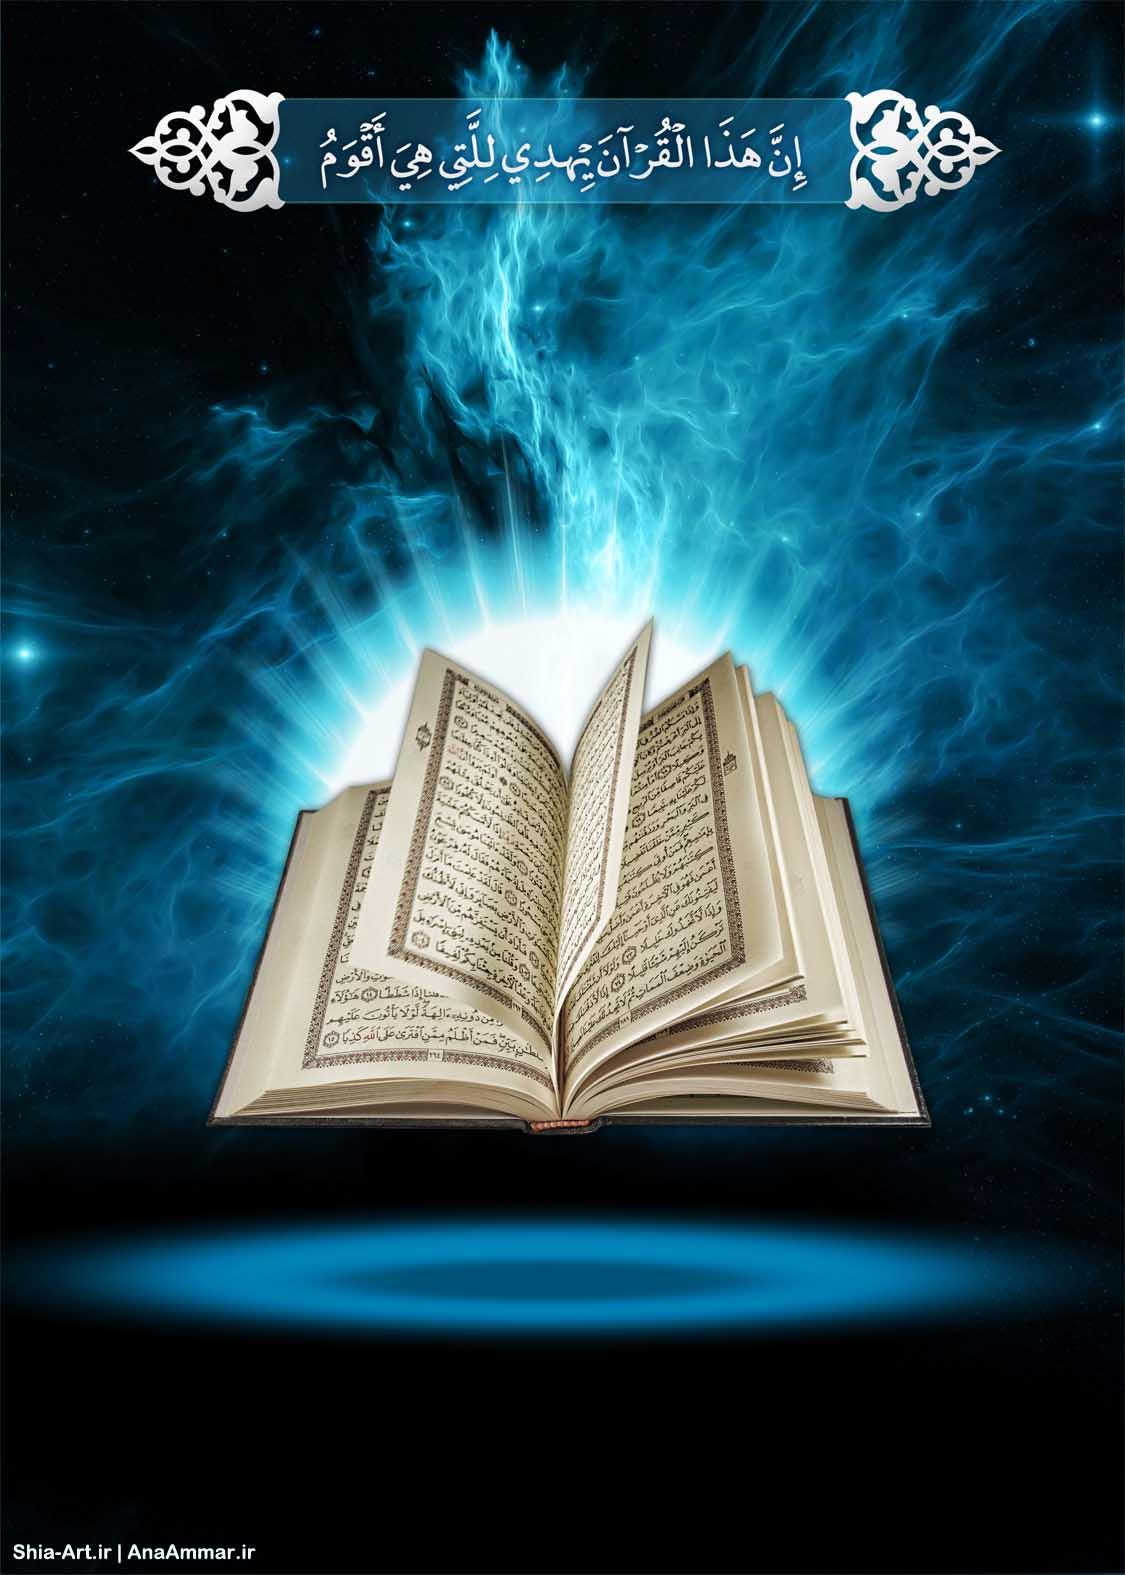 بنر و پوستر محافل قرآنی - قسمت دوم